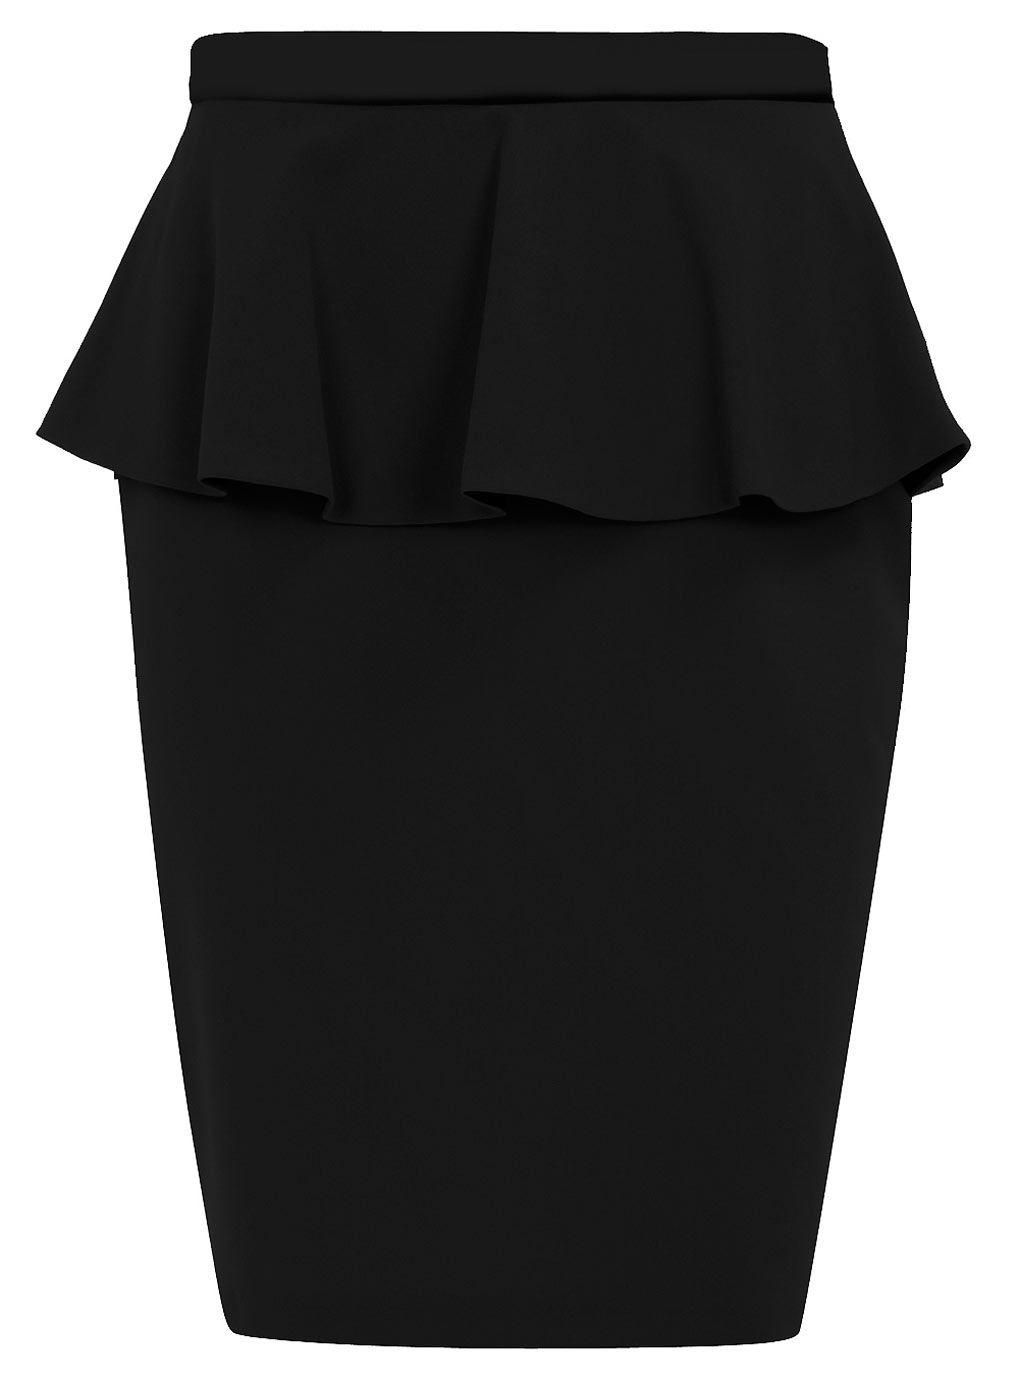 8e1664b67c H & M Peplum Pencil Skirt | Very stylish black peplum skirt made of really  flattering material.